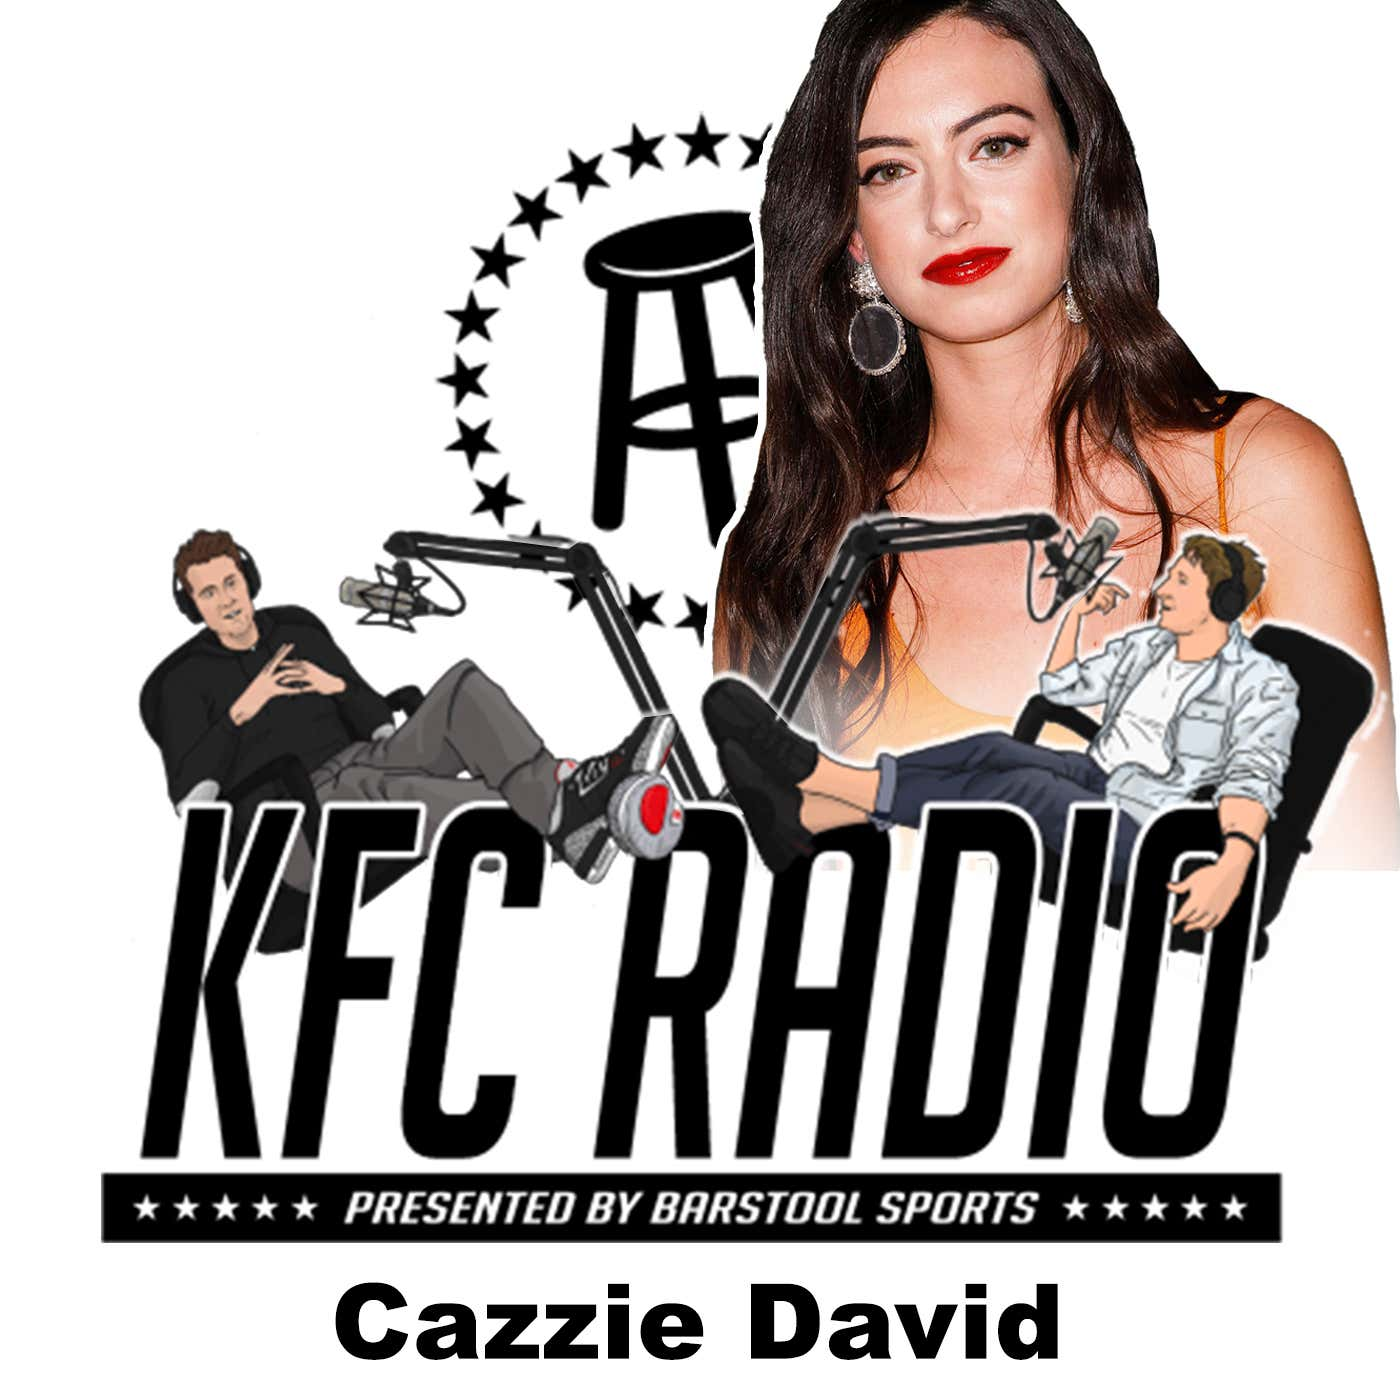 Cazzie David, Harry Styles Rockin a Dress, and International Men's Day